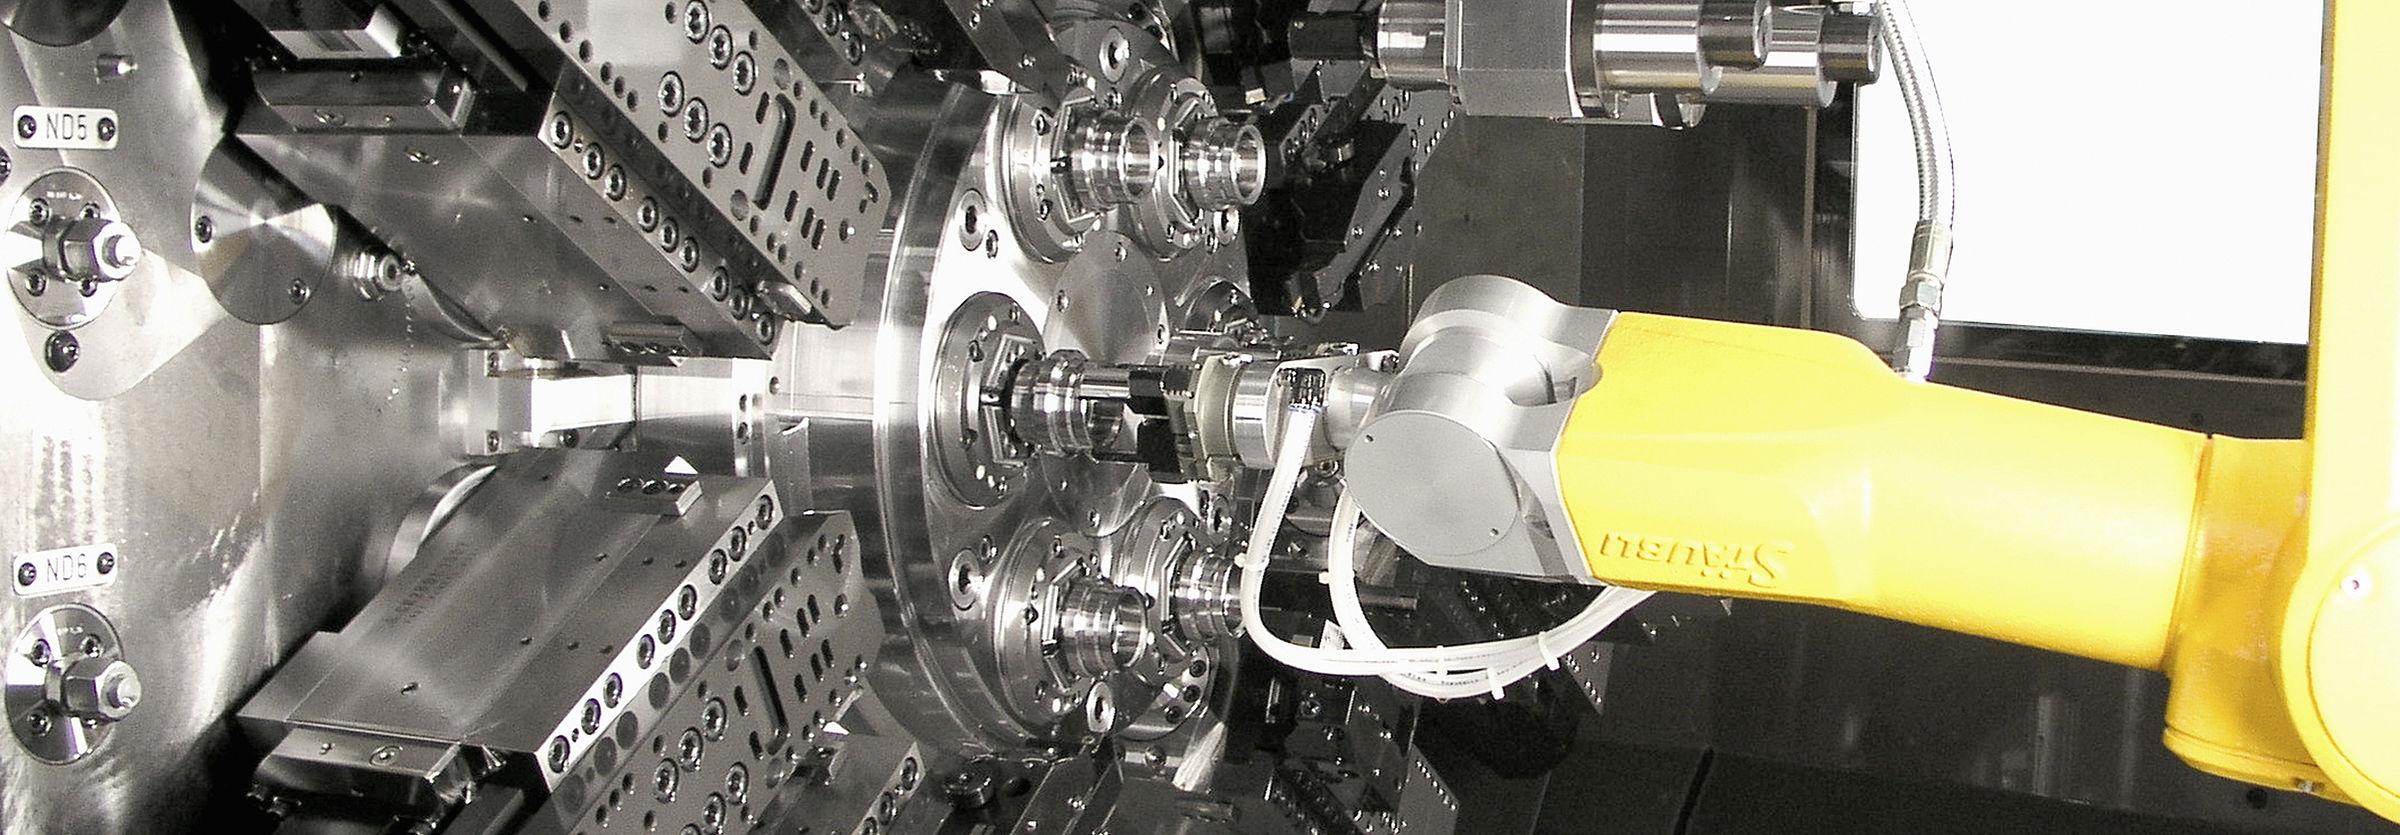 Stäubli AG - machine-tending-Index-robotic-solution-hip@2x.jpg